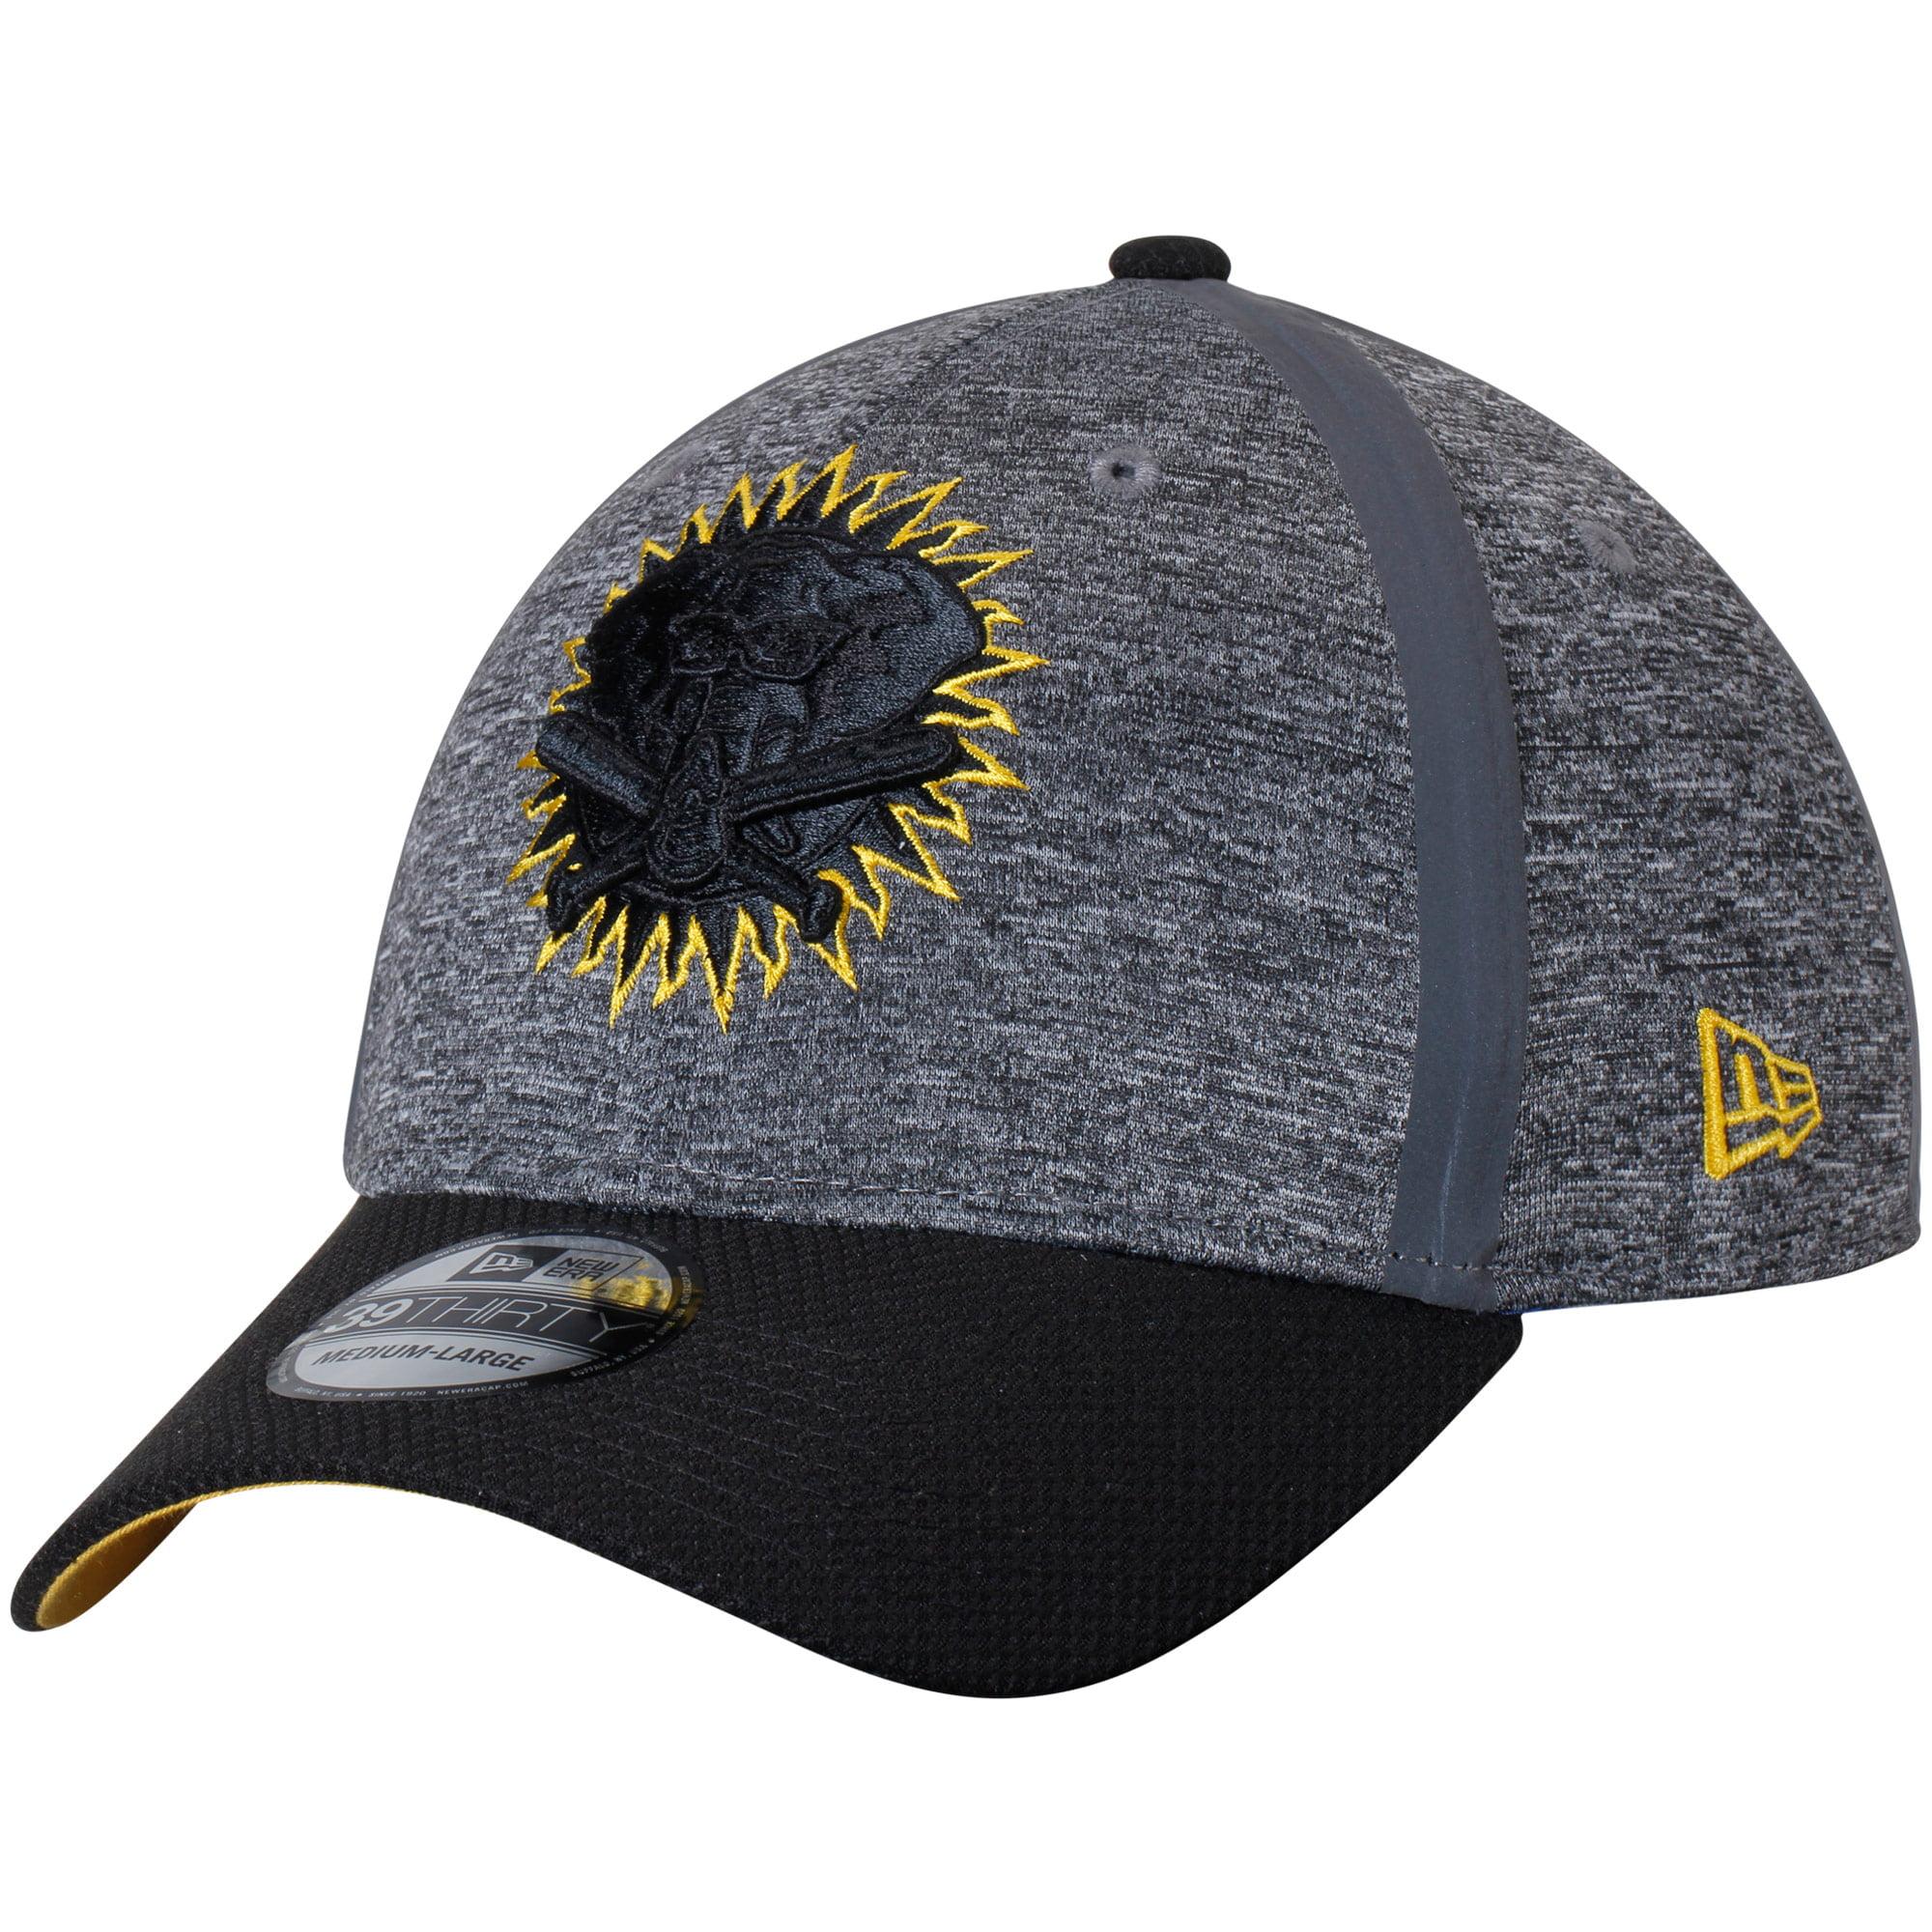 Oakland Athletics New Era Clubhouse 39THIRTY Flex Hat - Heathered Gray/Black